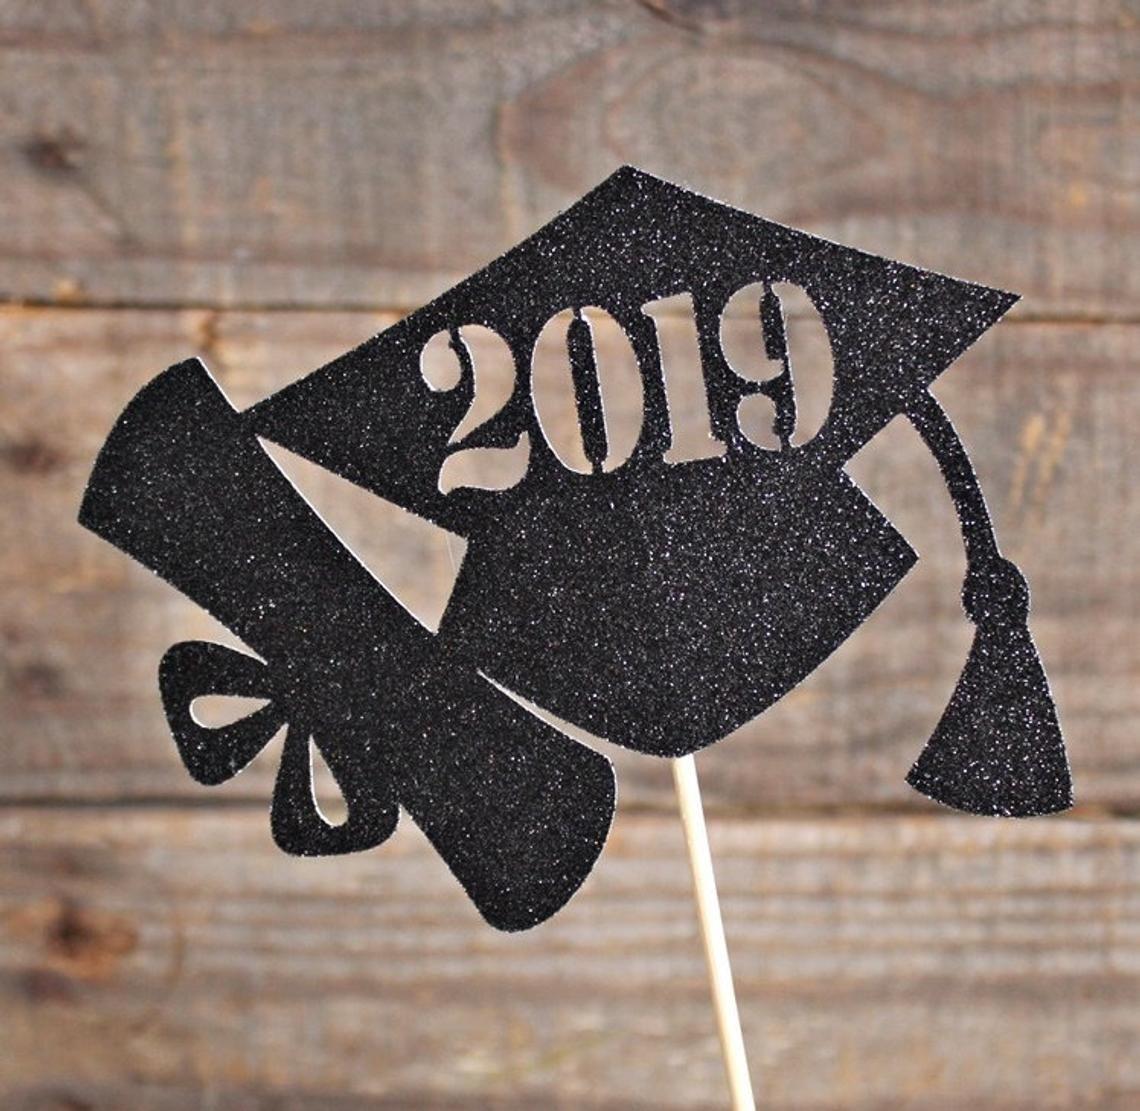 Class of 2019 / Graduation Centerpiece Pick / 2019